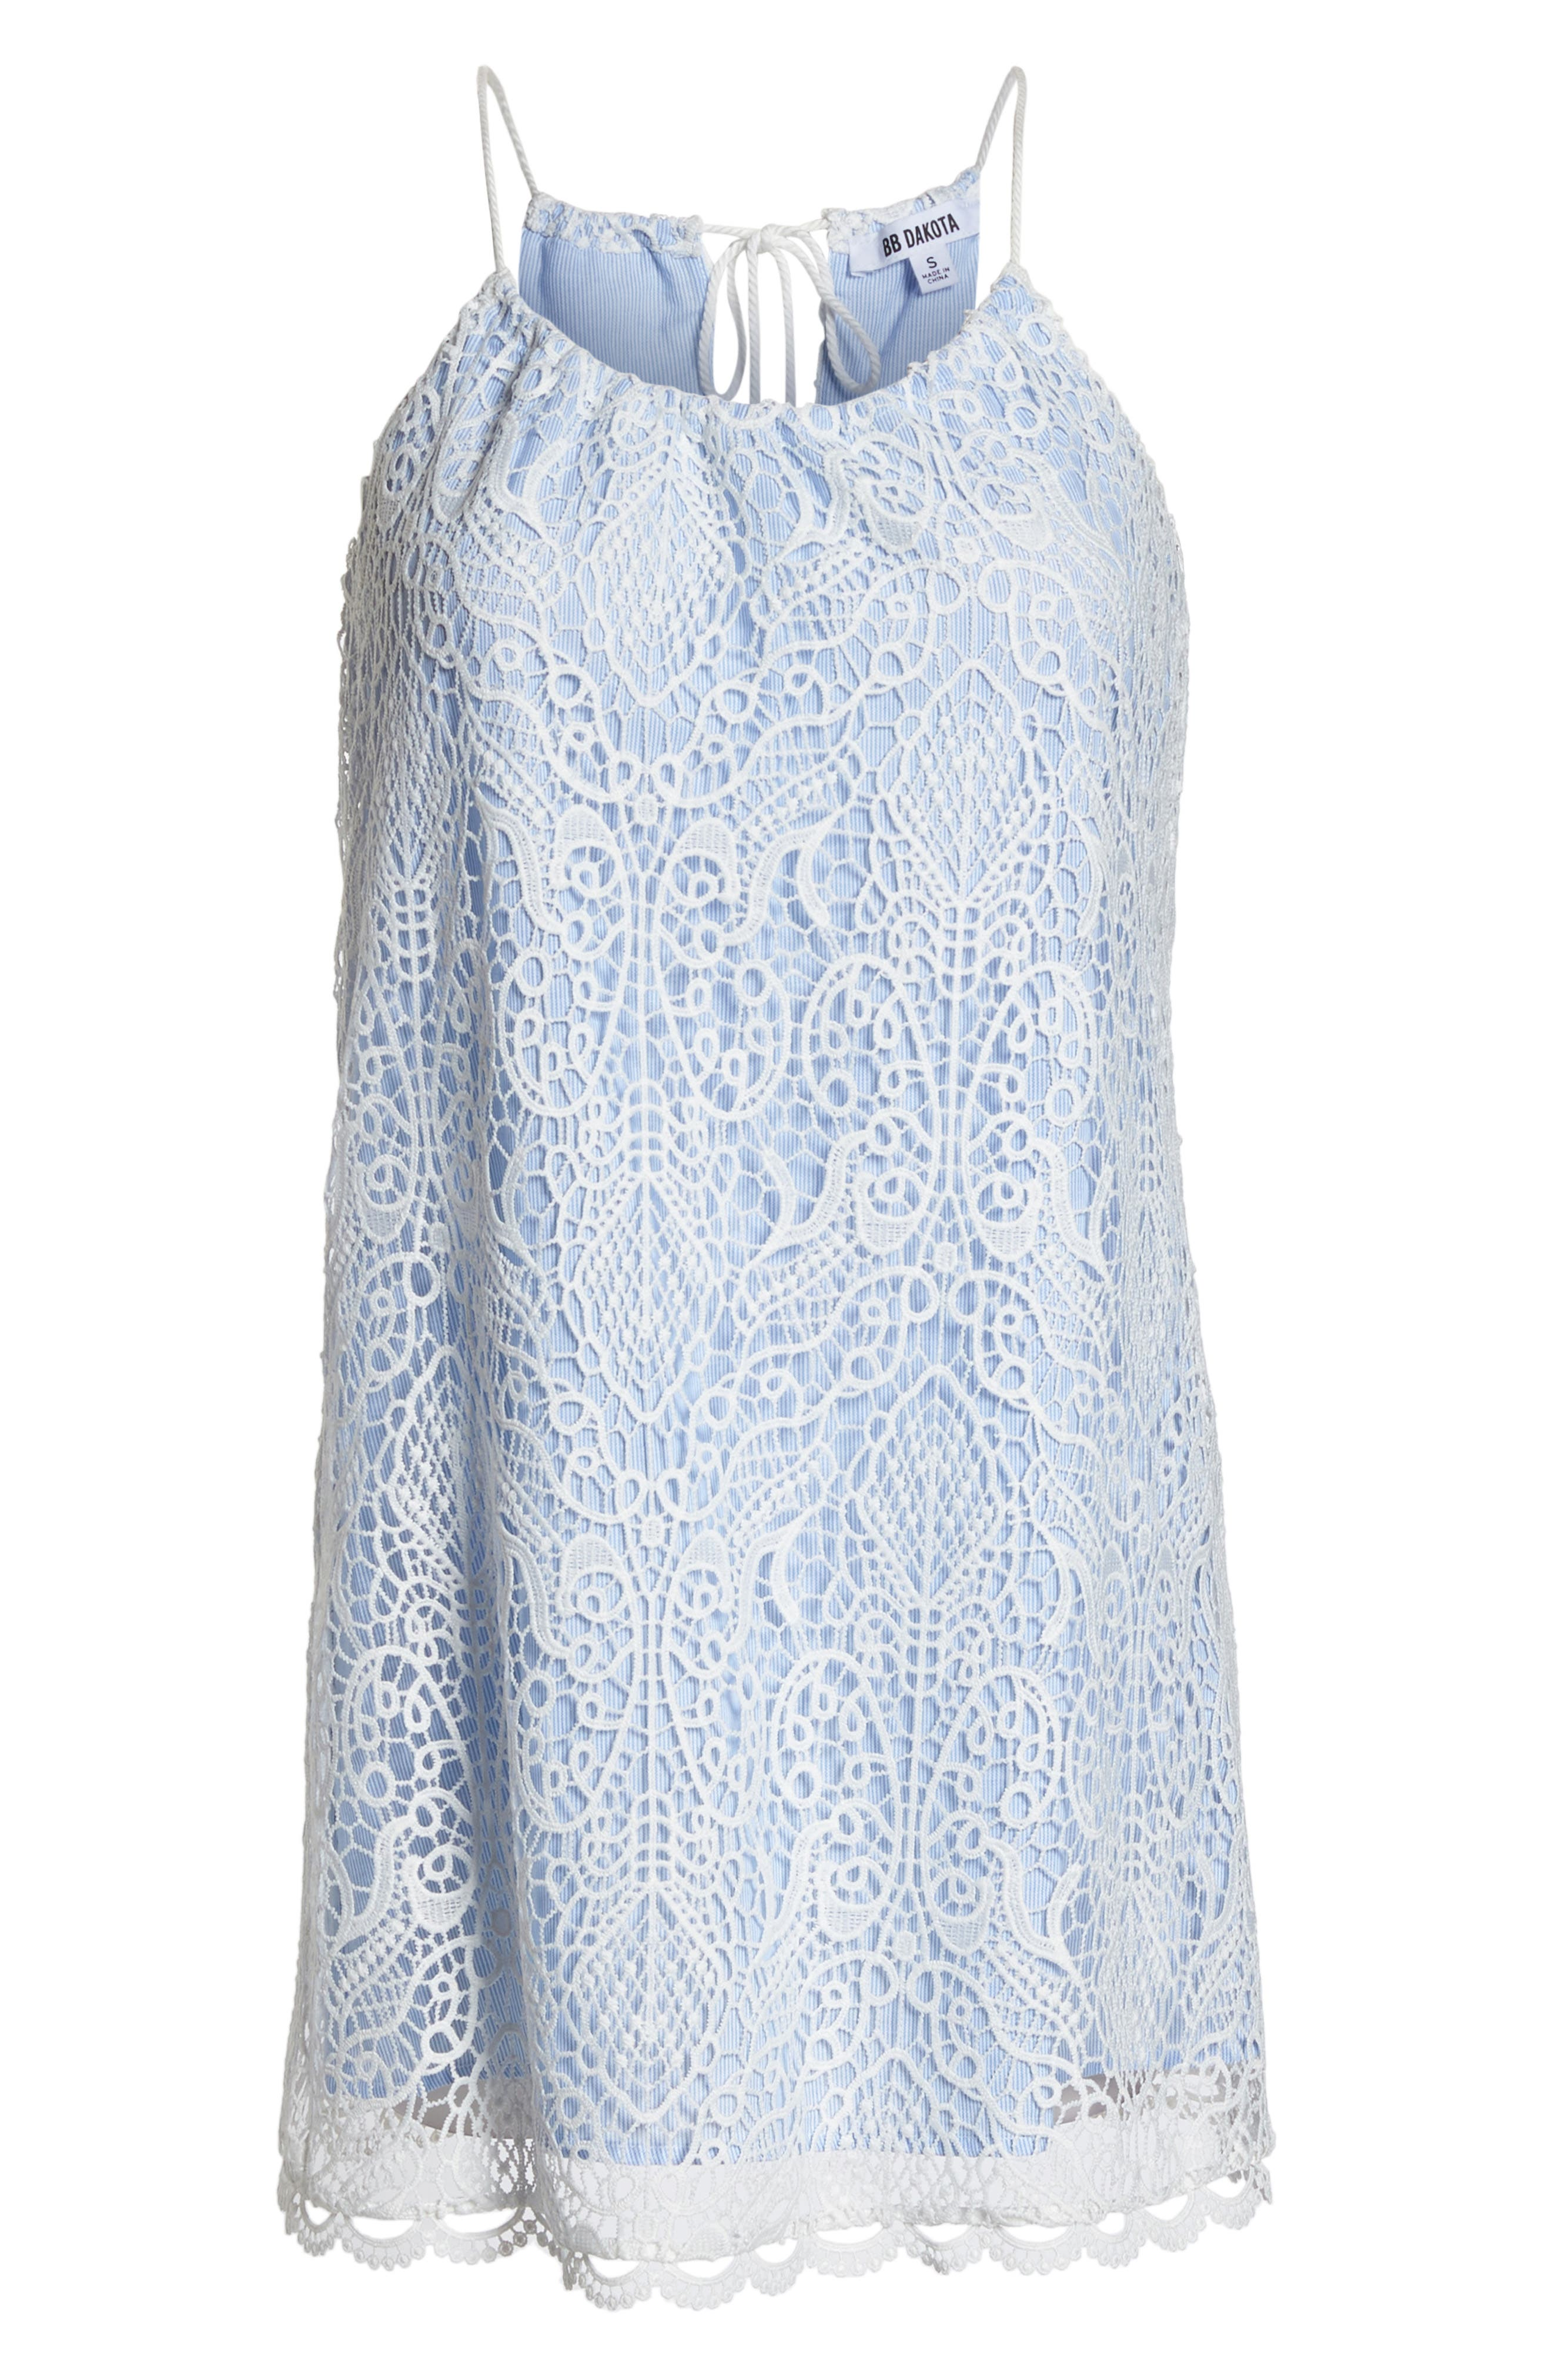 Pinstripe Cotton Lace Shift Dress,                             Alternate thumbnail 7, color,                             110